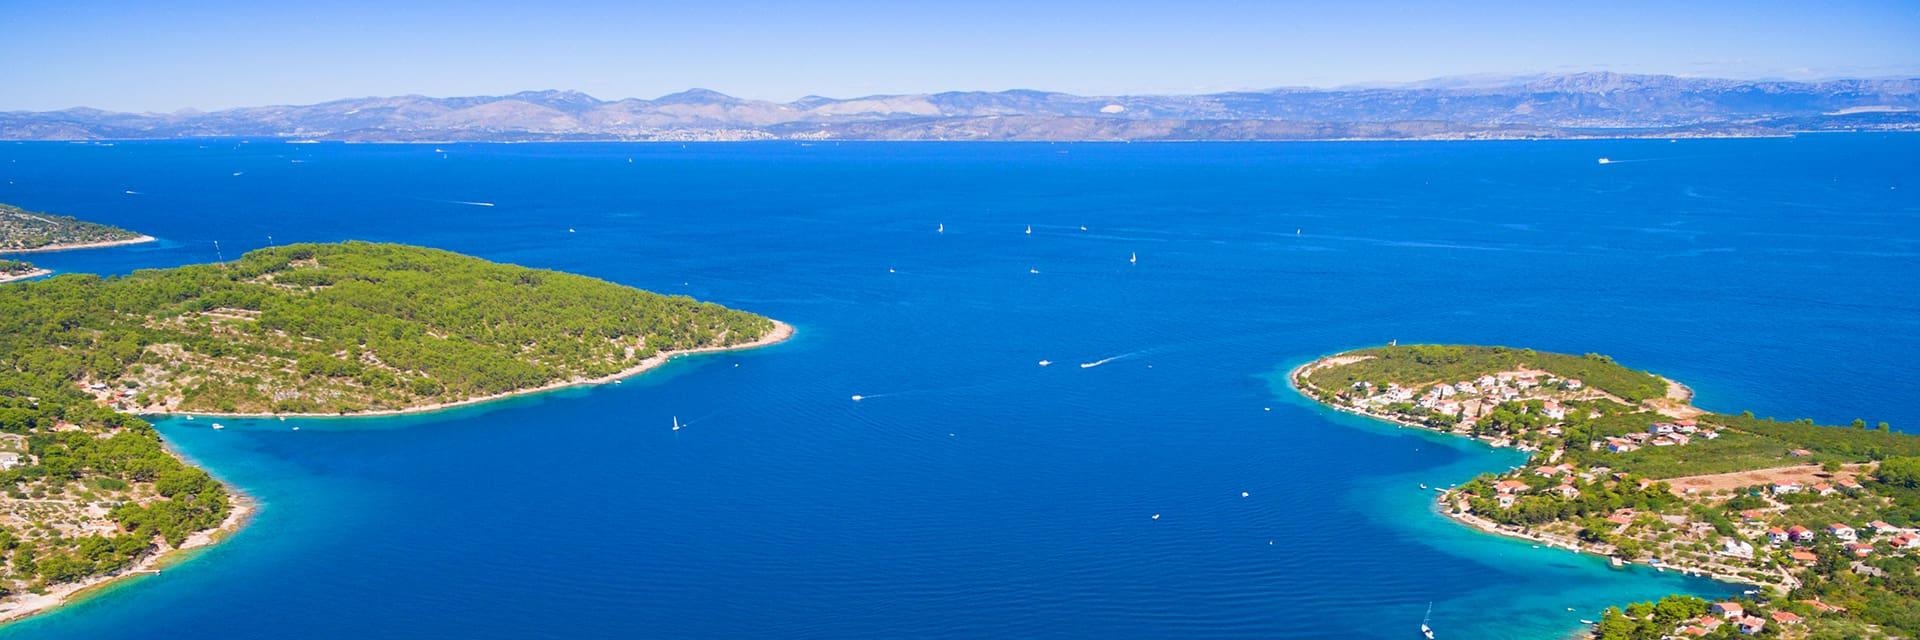 Island hopping in Croatia - Header image